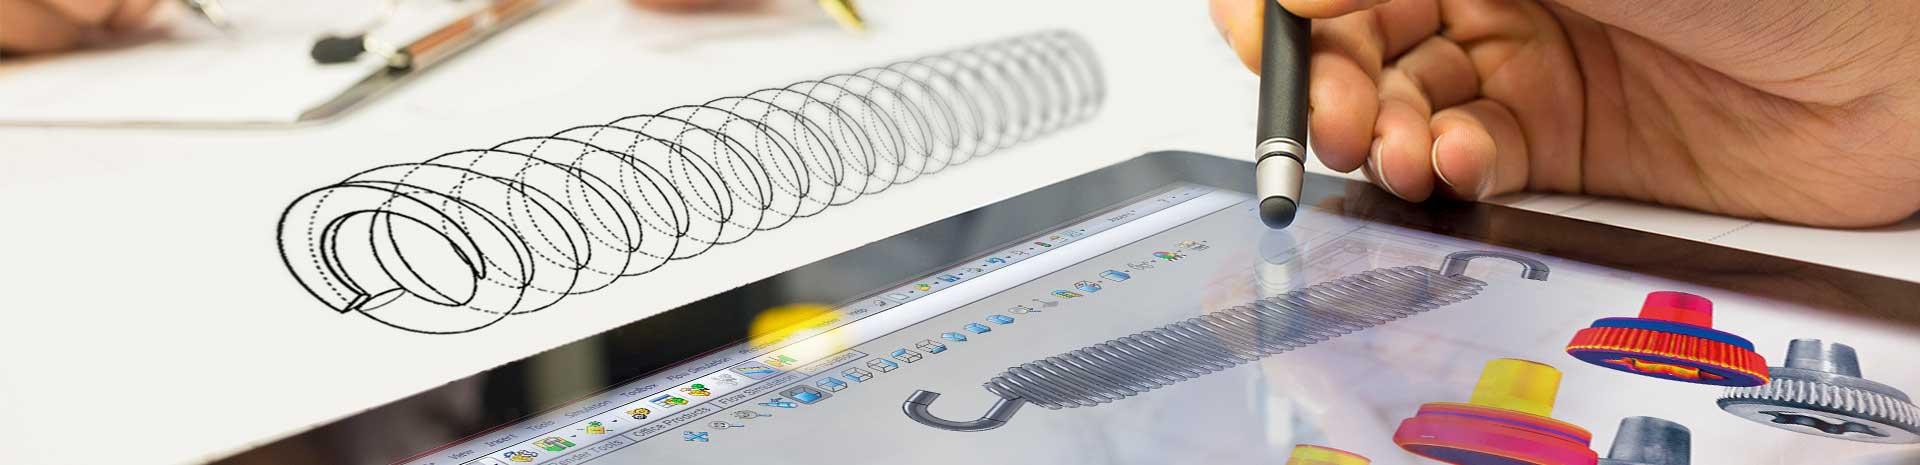 custom component design, custom spring design